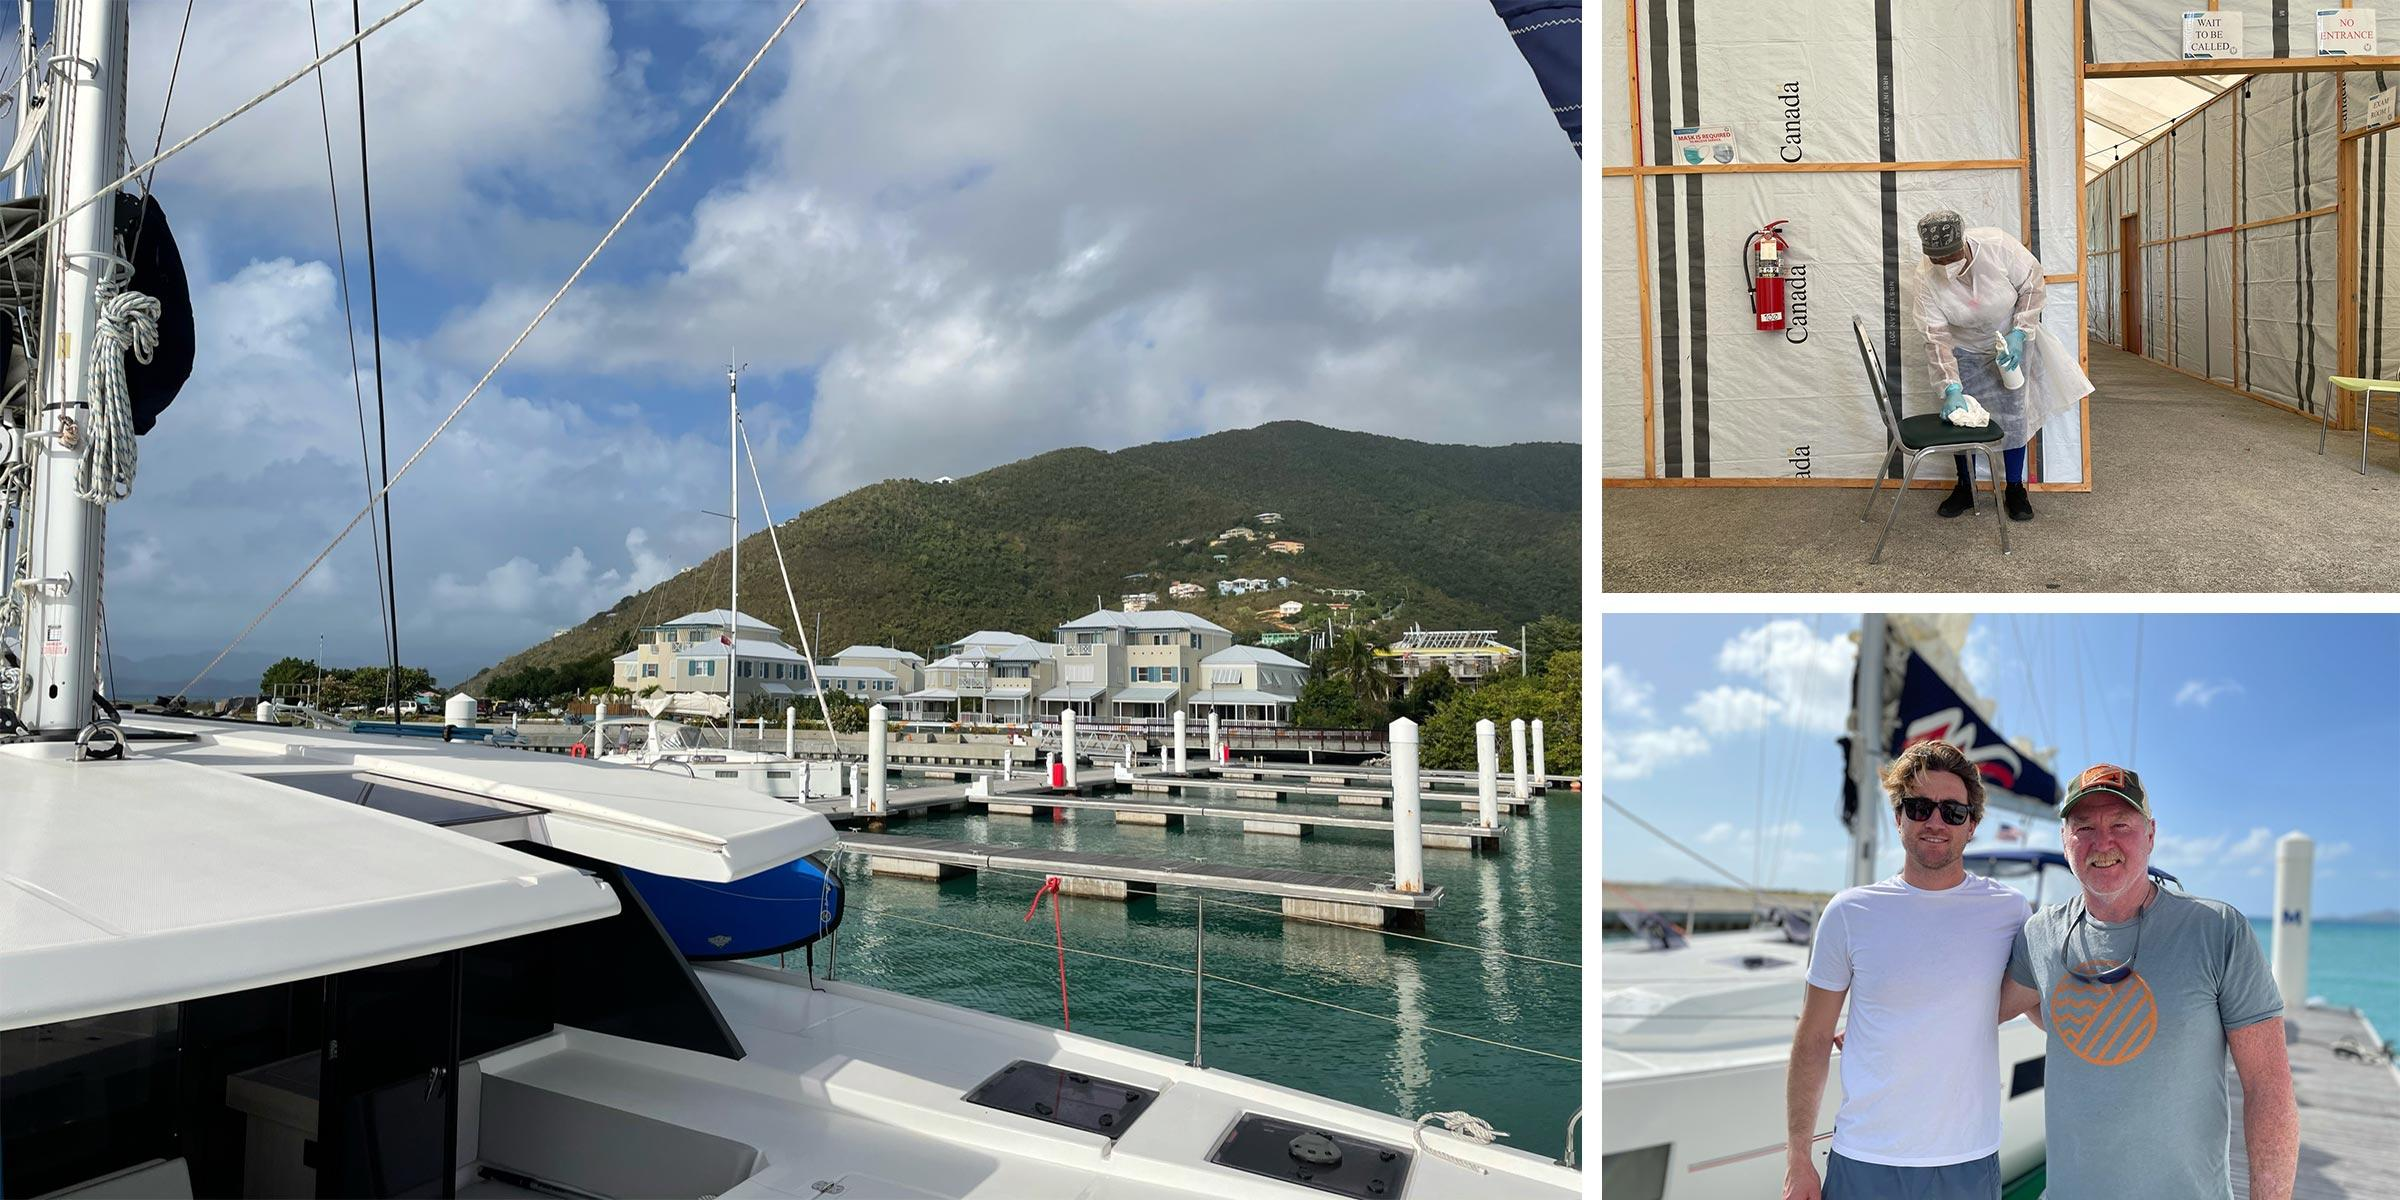 Nanny Cay Marina, COVID testing, charter guests Stuart and Max